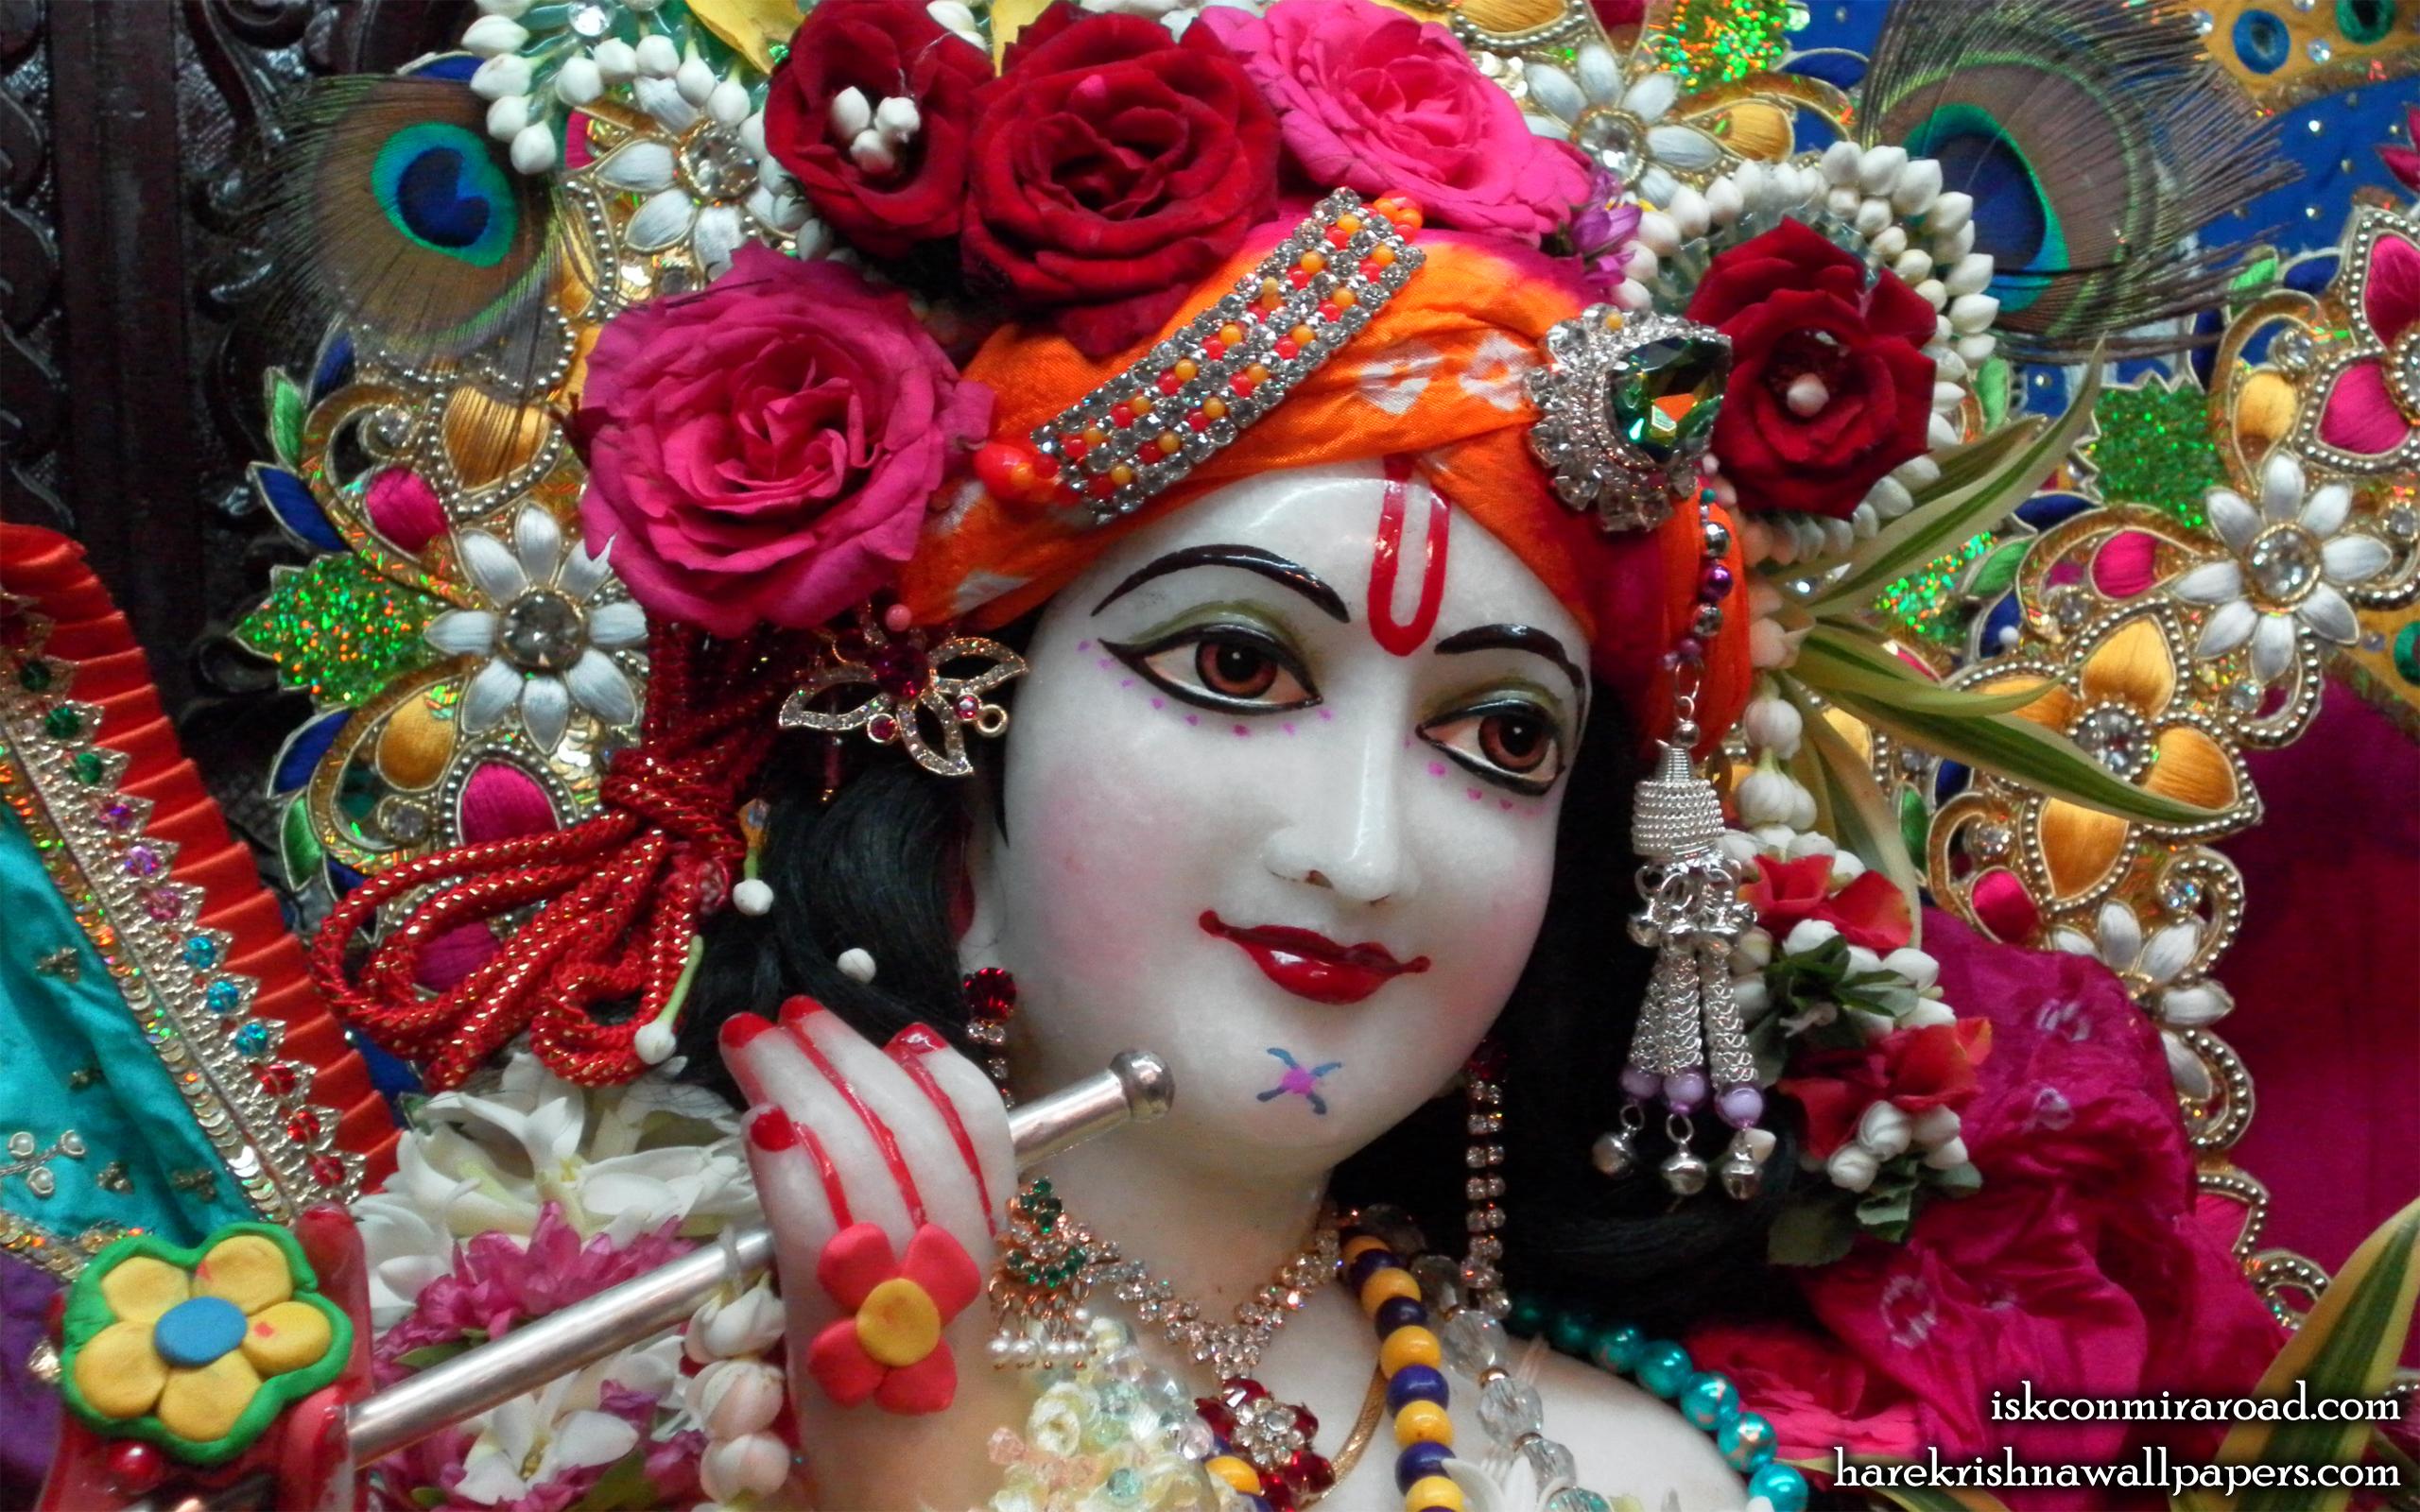 Sri Giridhari Close up Wallpaper (002) Size 2560x1600 Download